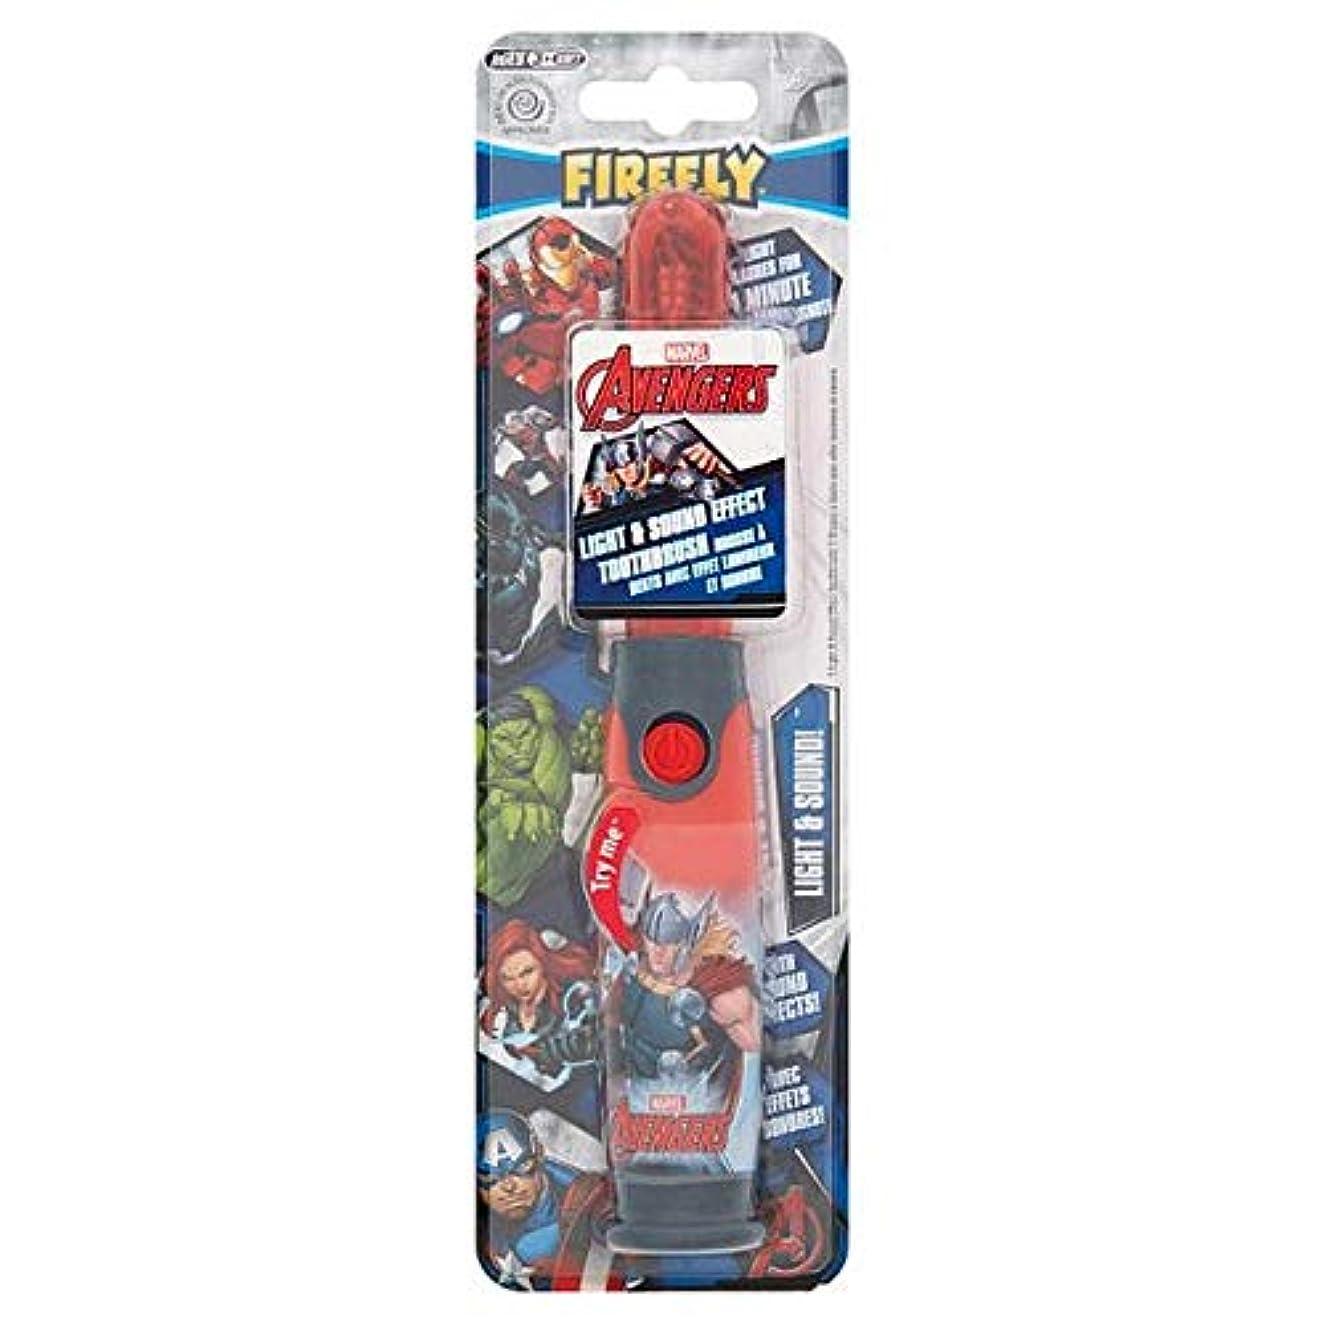 [Firefly ] アベンジャーズホタルの光と音の歯ブラシ - Avengers Firefly Light And Sound Toothbrush [並行輸入品]